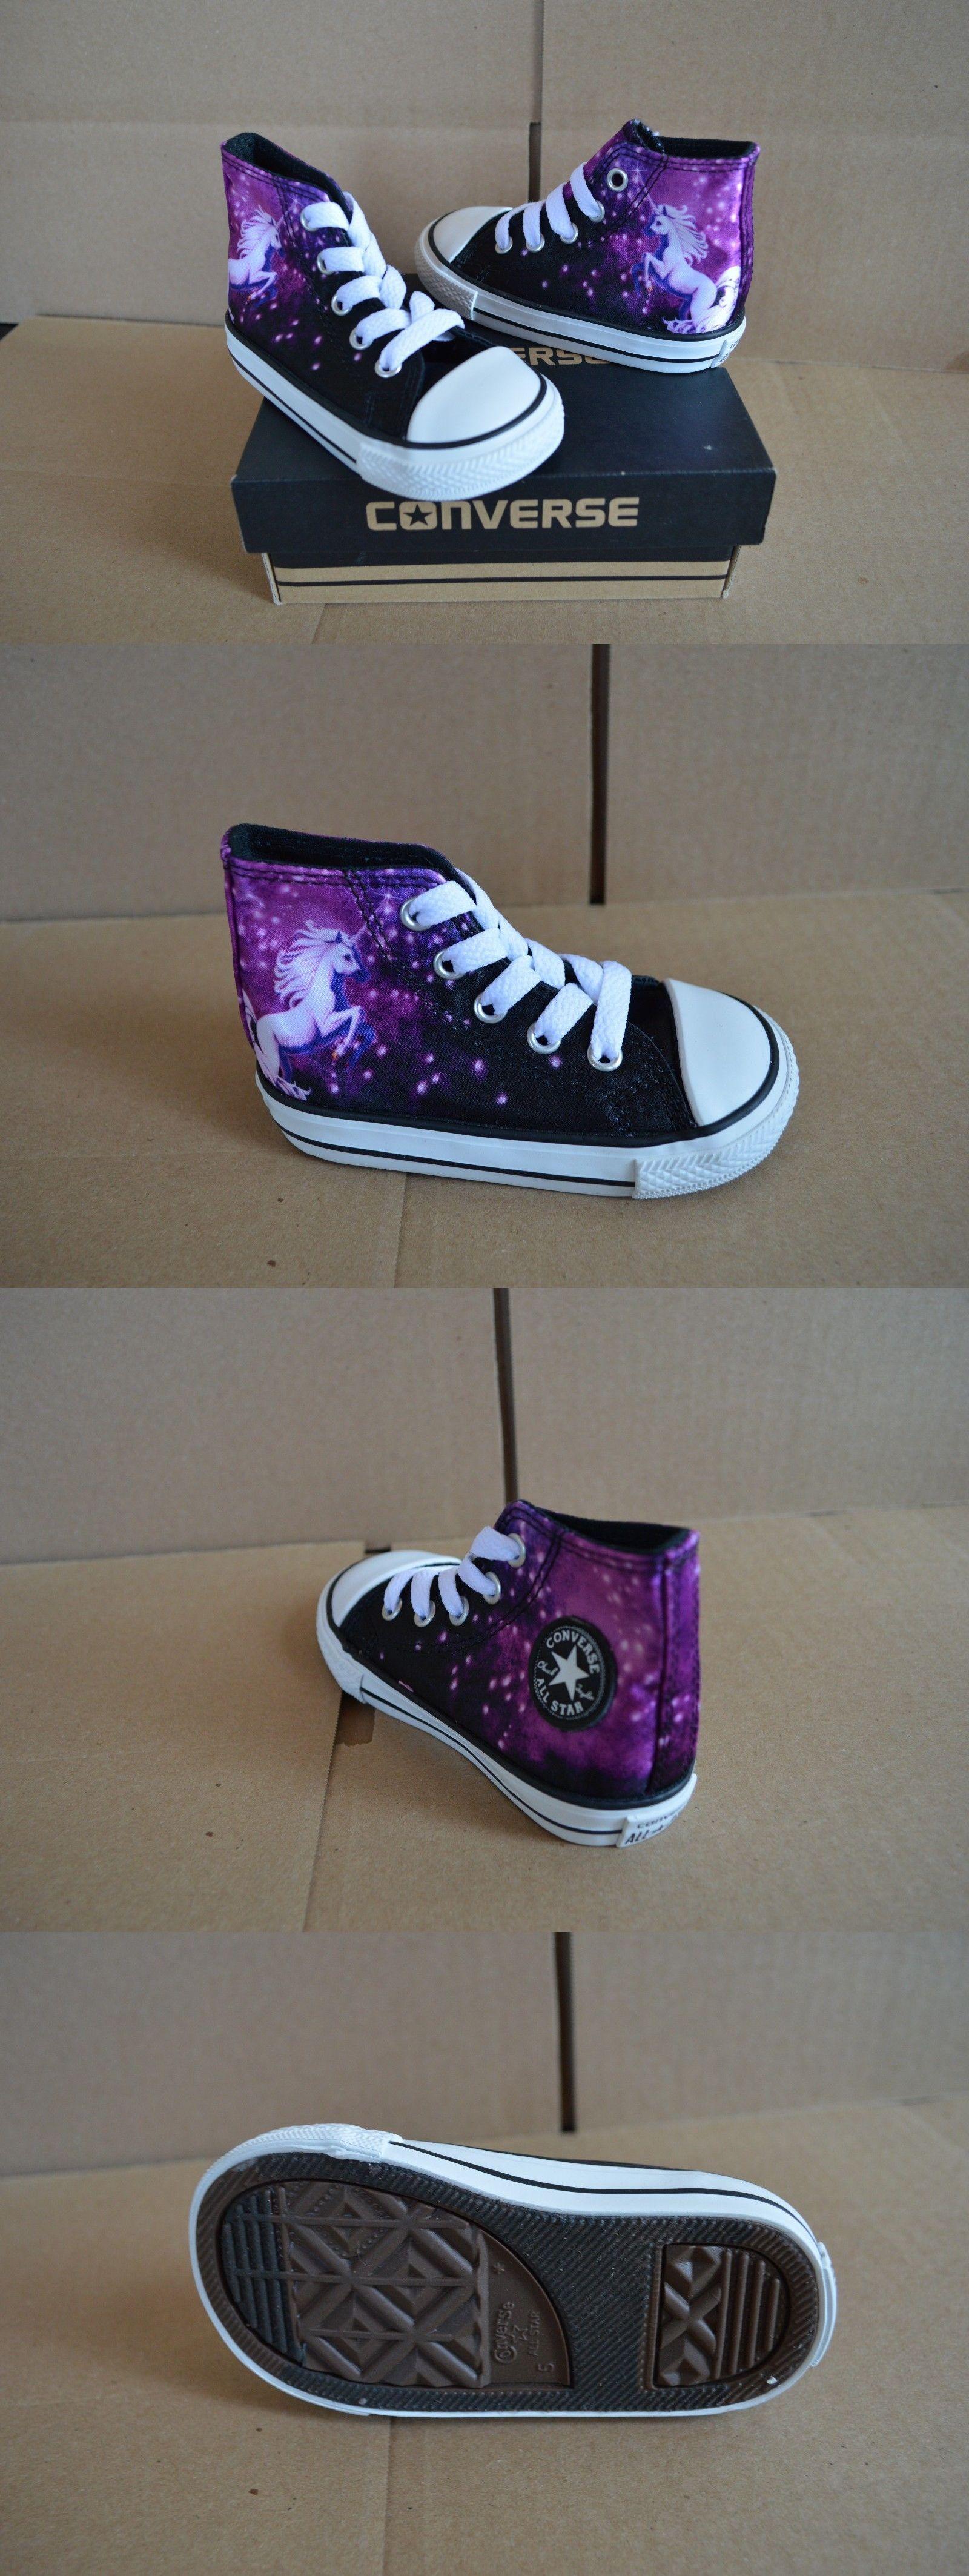 Baby Shoes New Converse Ct All Star Black Purple Unicorn